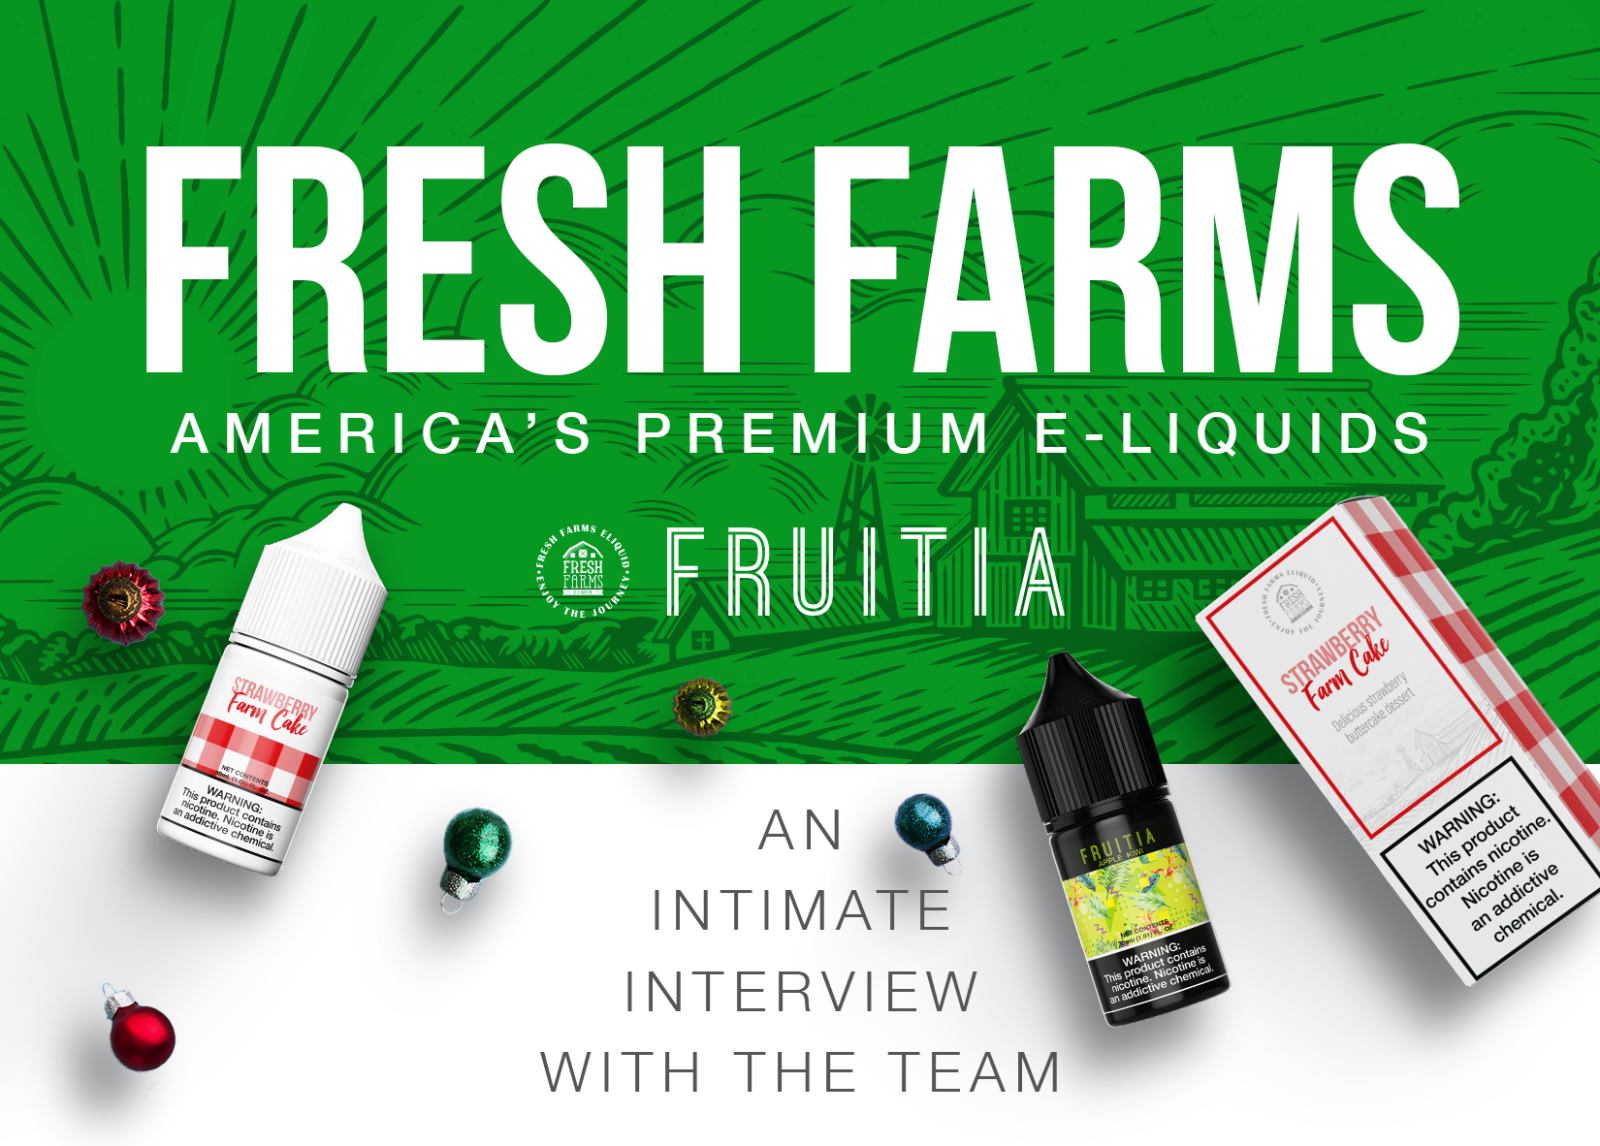 December 2020 Interview With Fresh Farms / Fruitia America's Premium E-Liquids